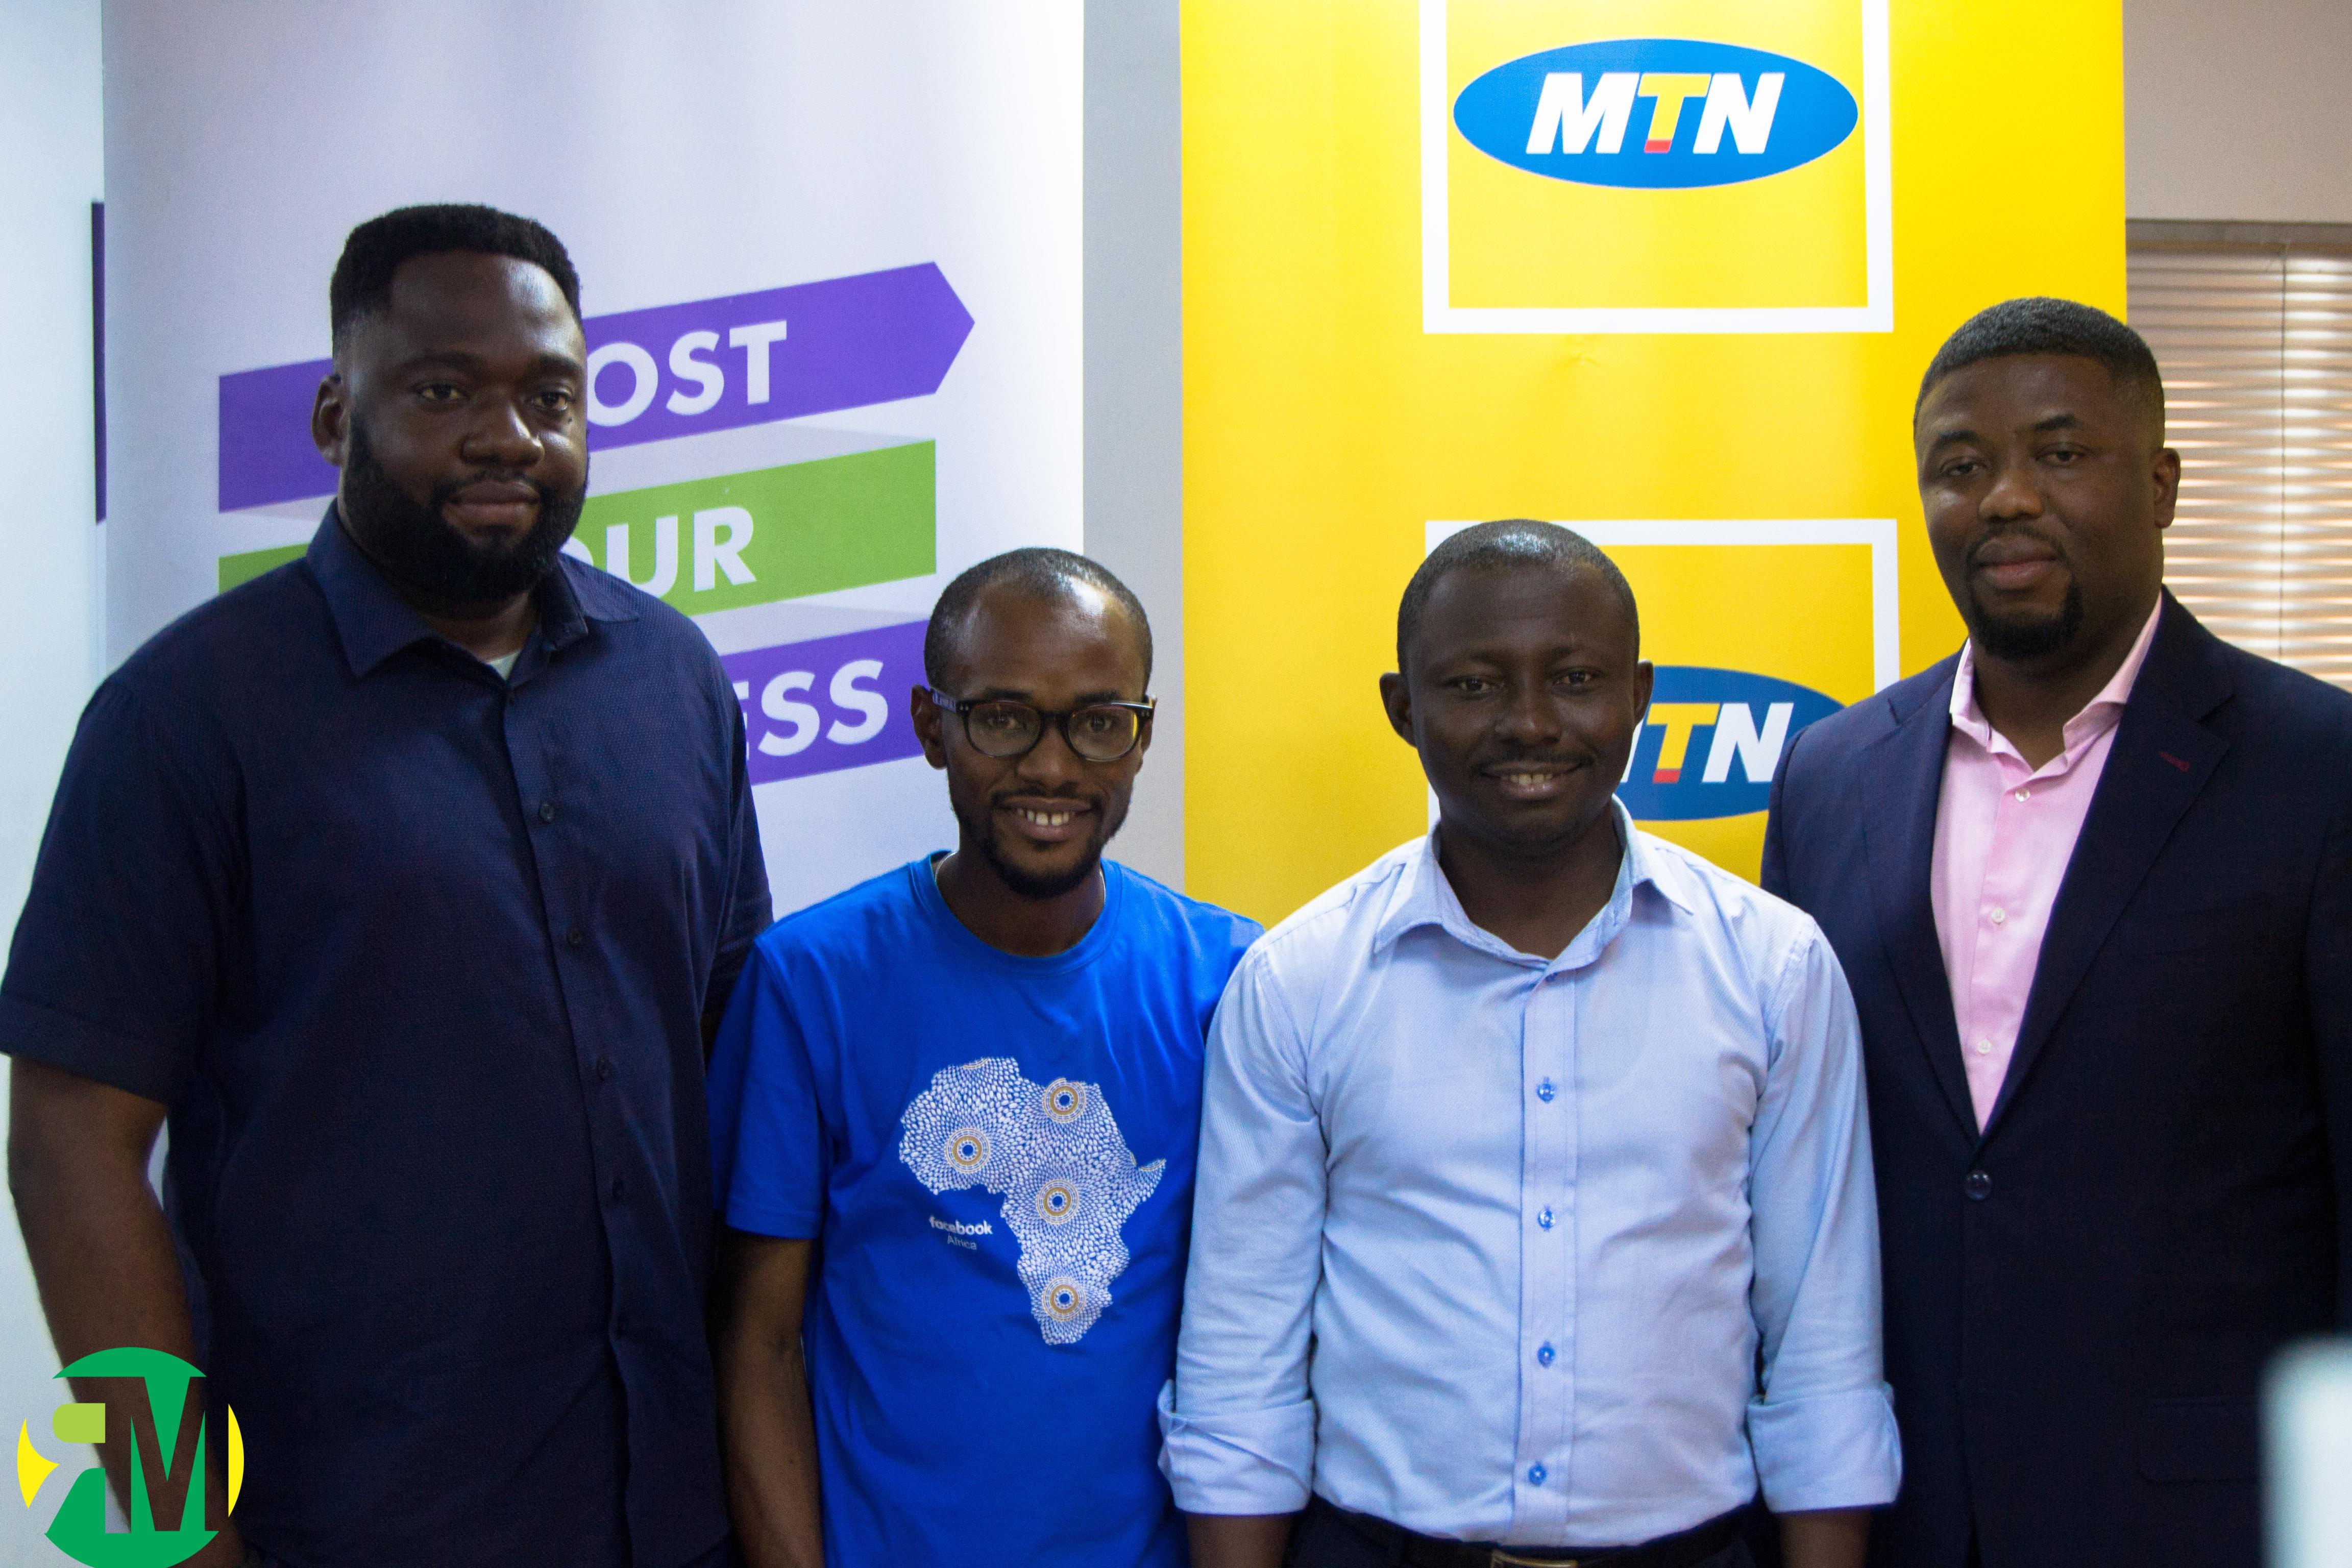 Rabbington Media Collaborates with MTN Nigeria